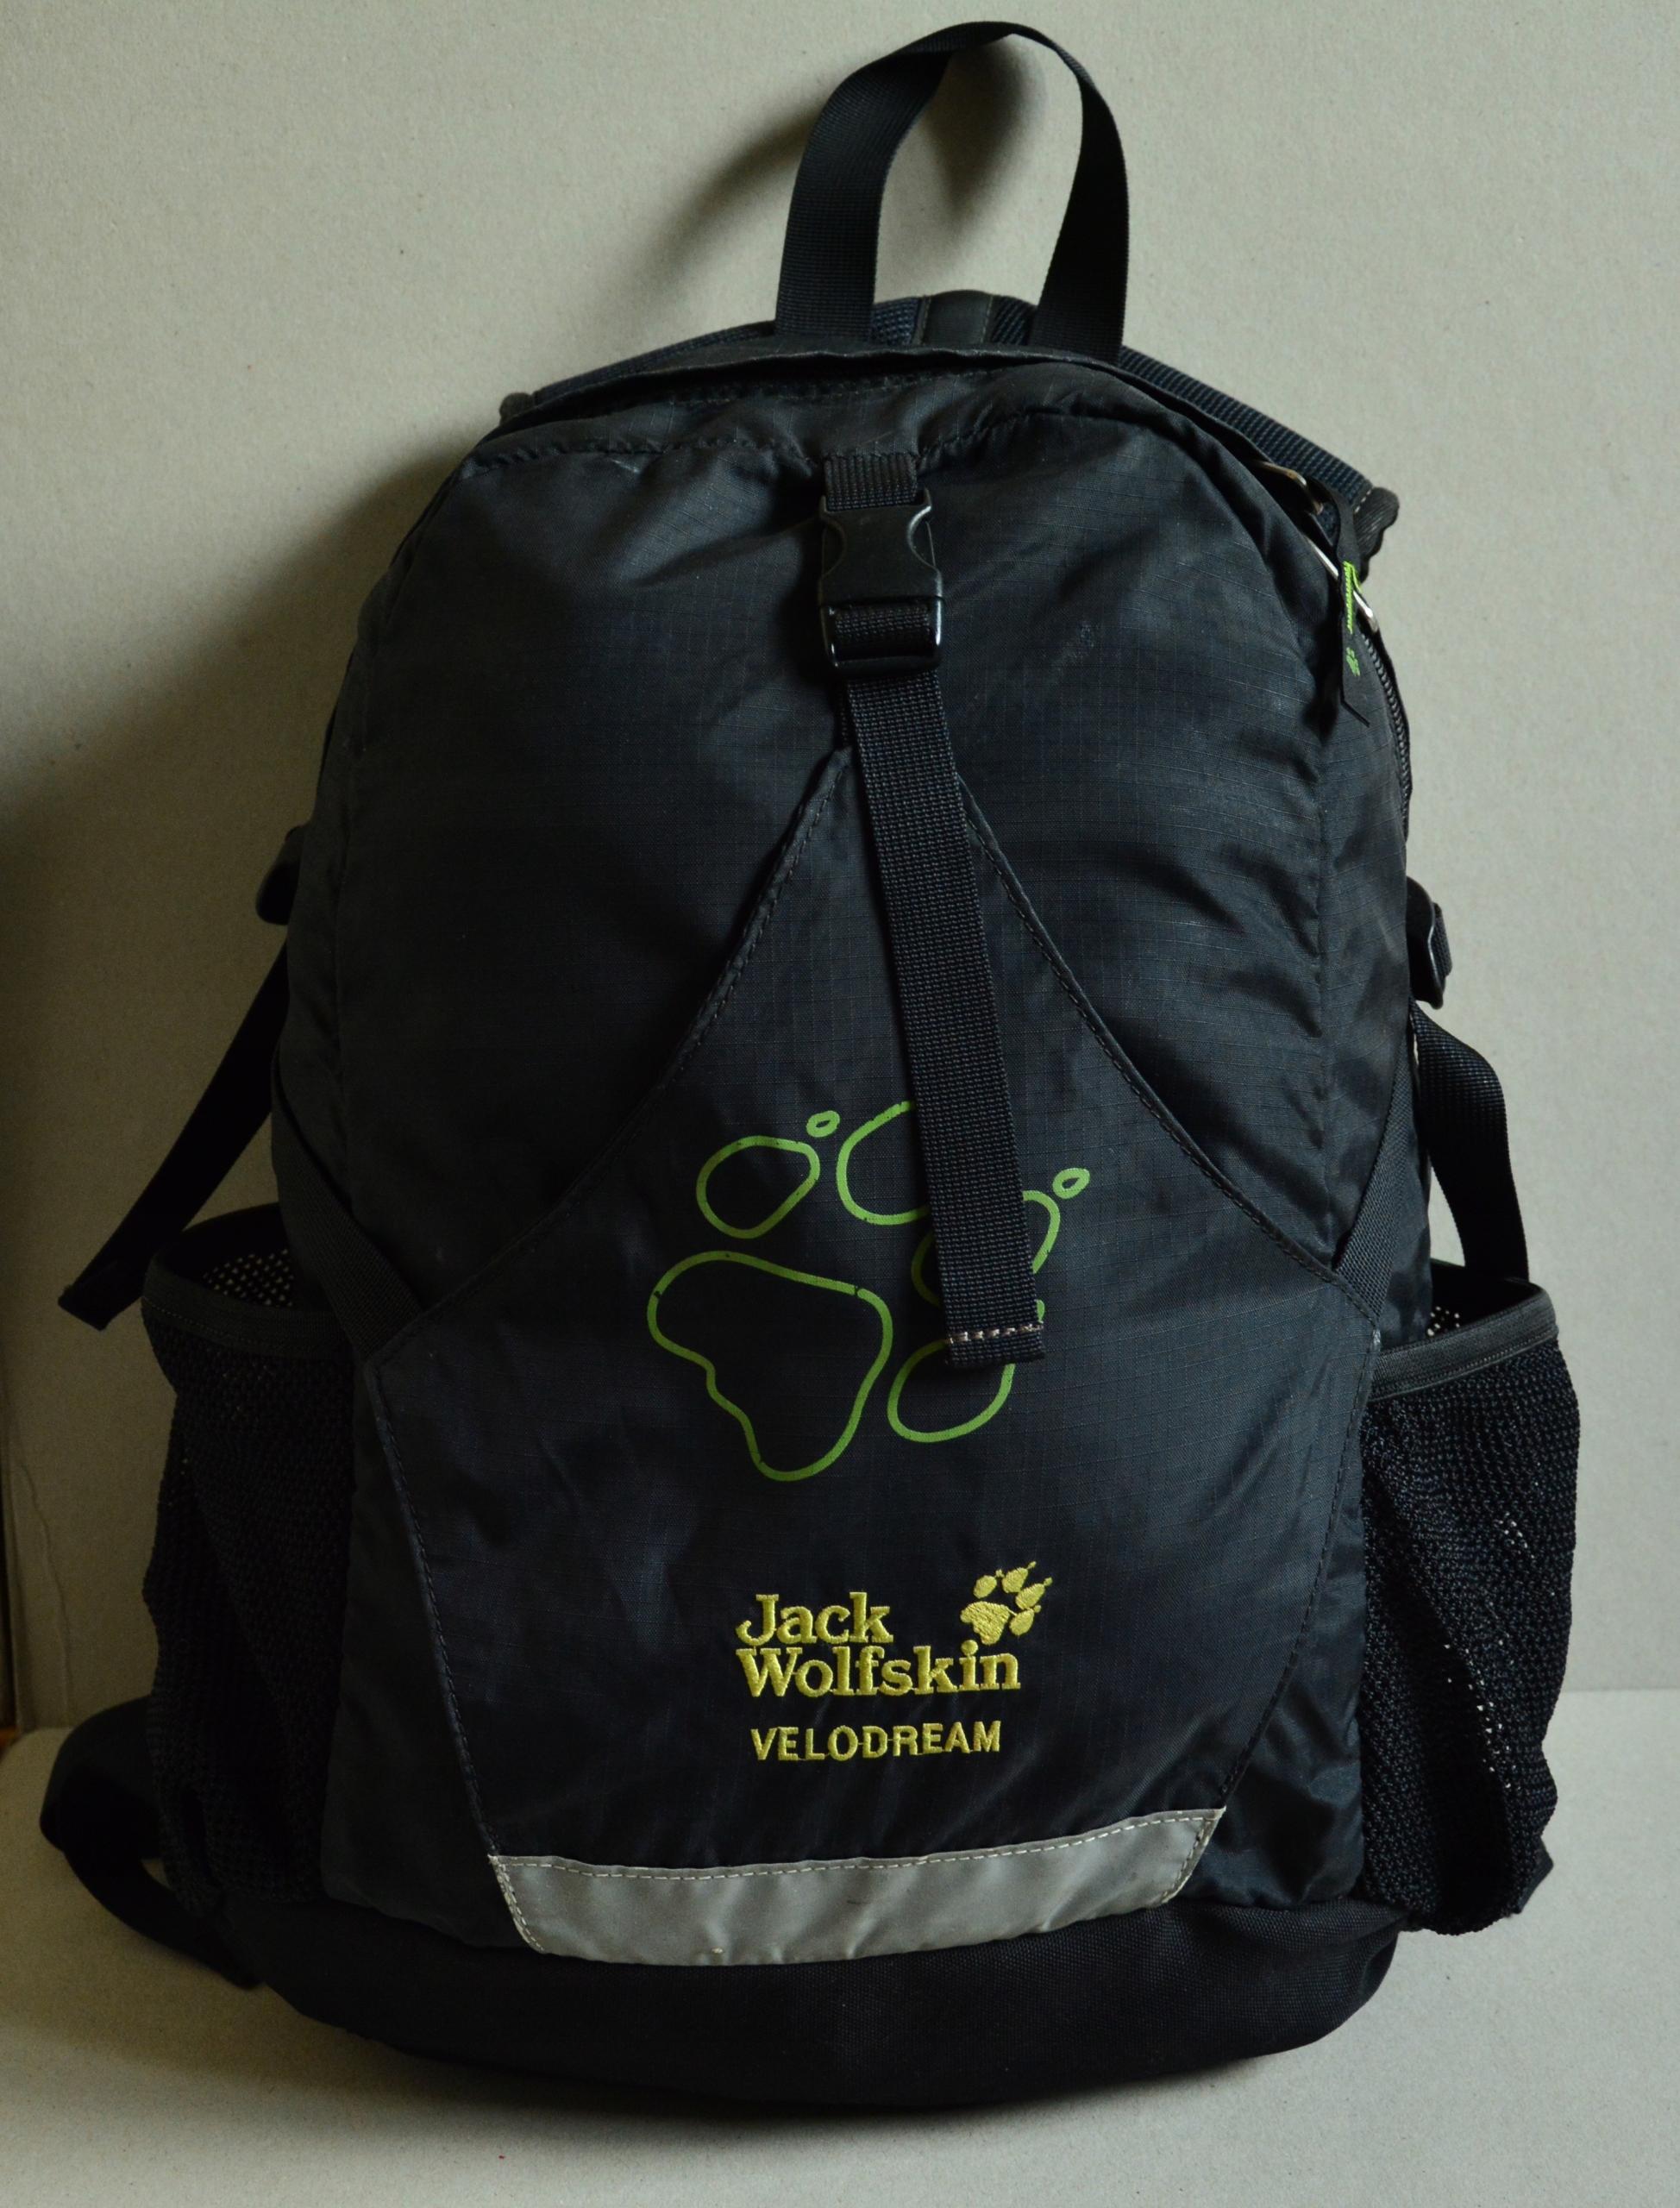 Plecak JACK WOLFSKIN VELODREAM